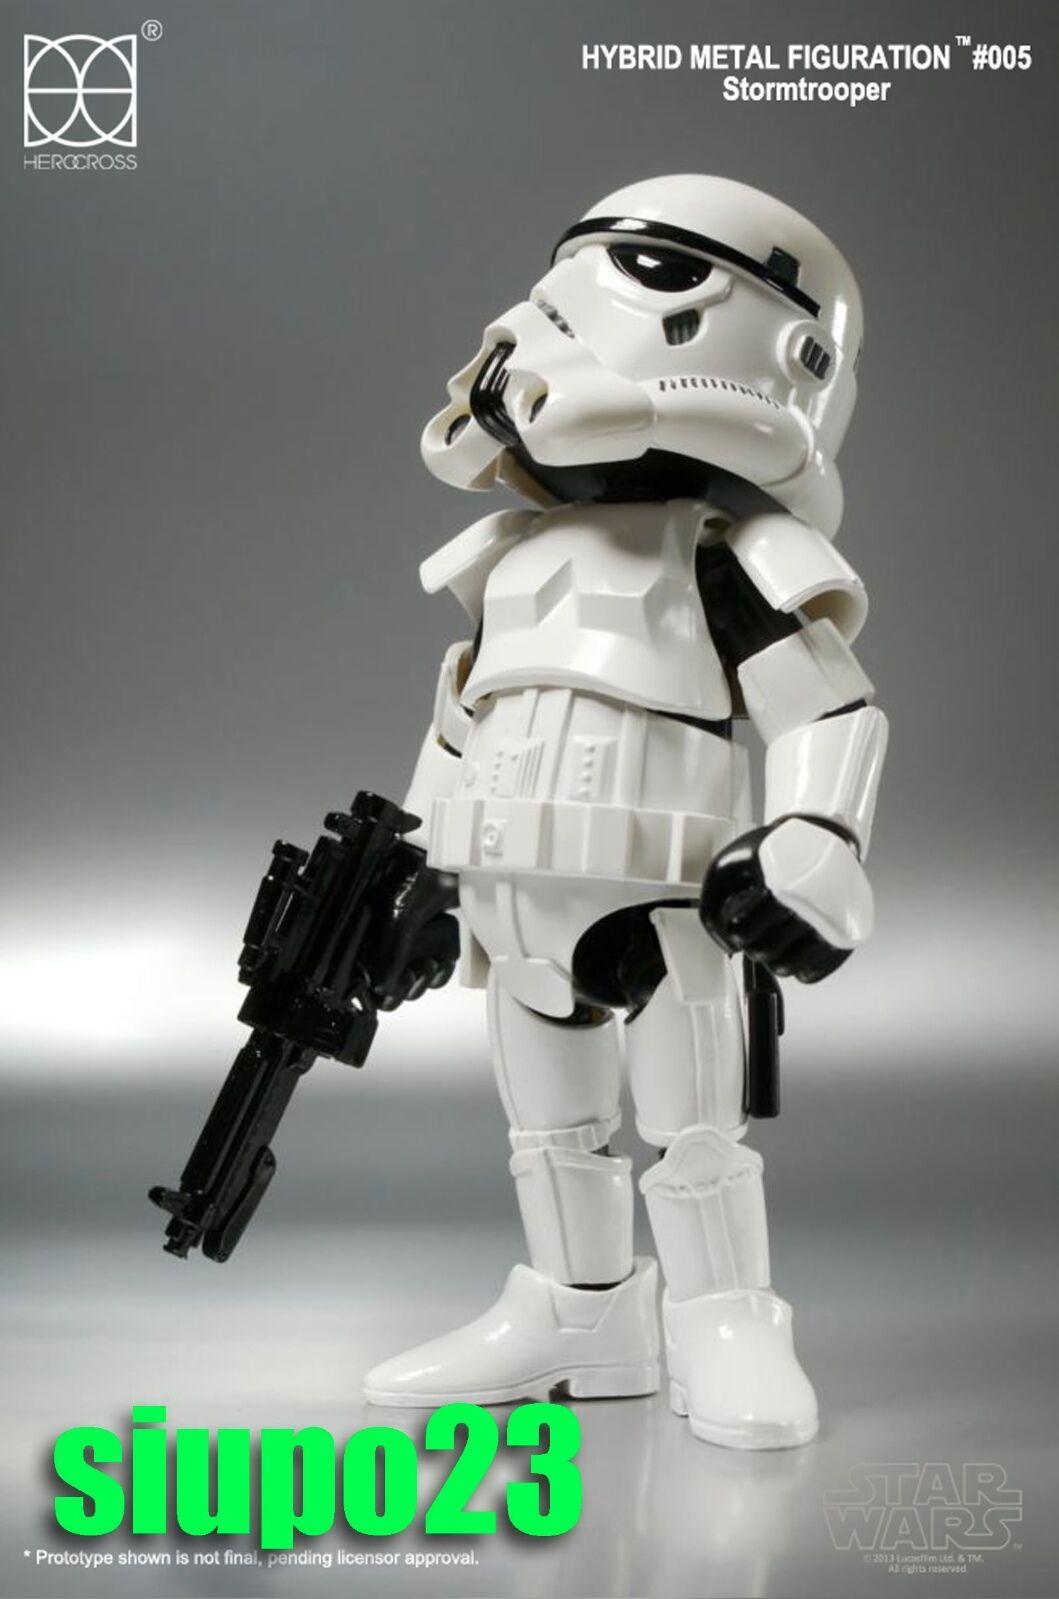 86hero Herocross  HMF HMF HMF Star Wars Stormtrooper Figure cbef65